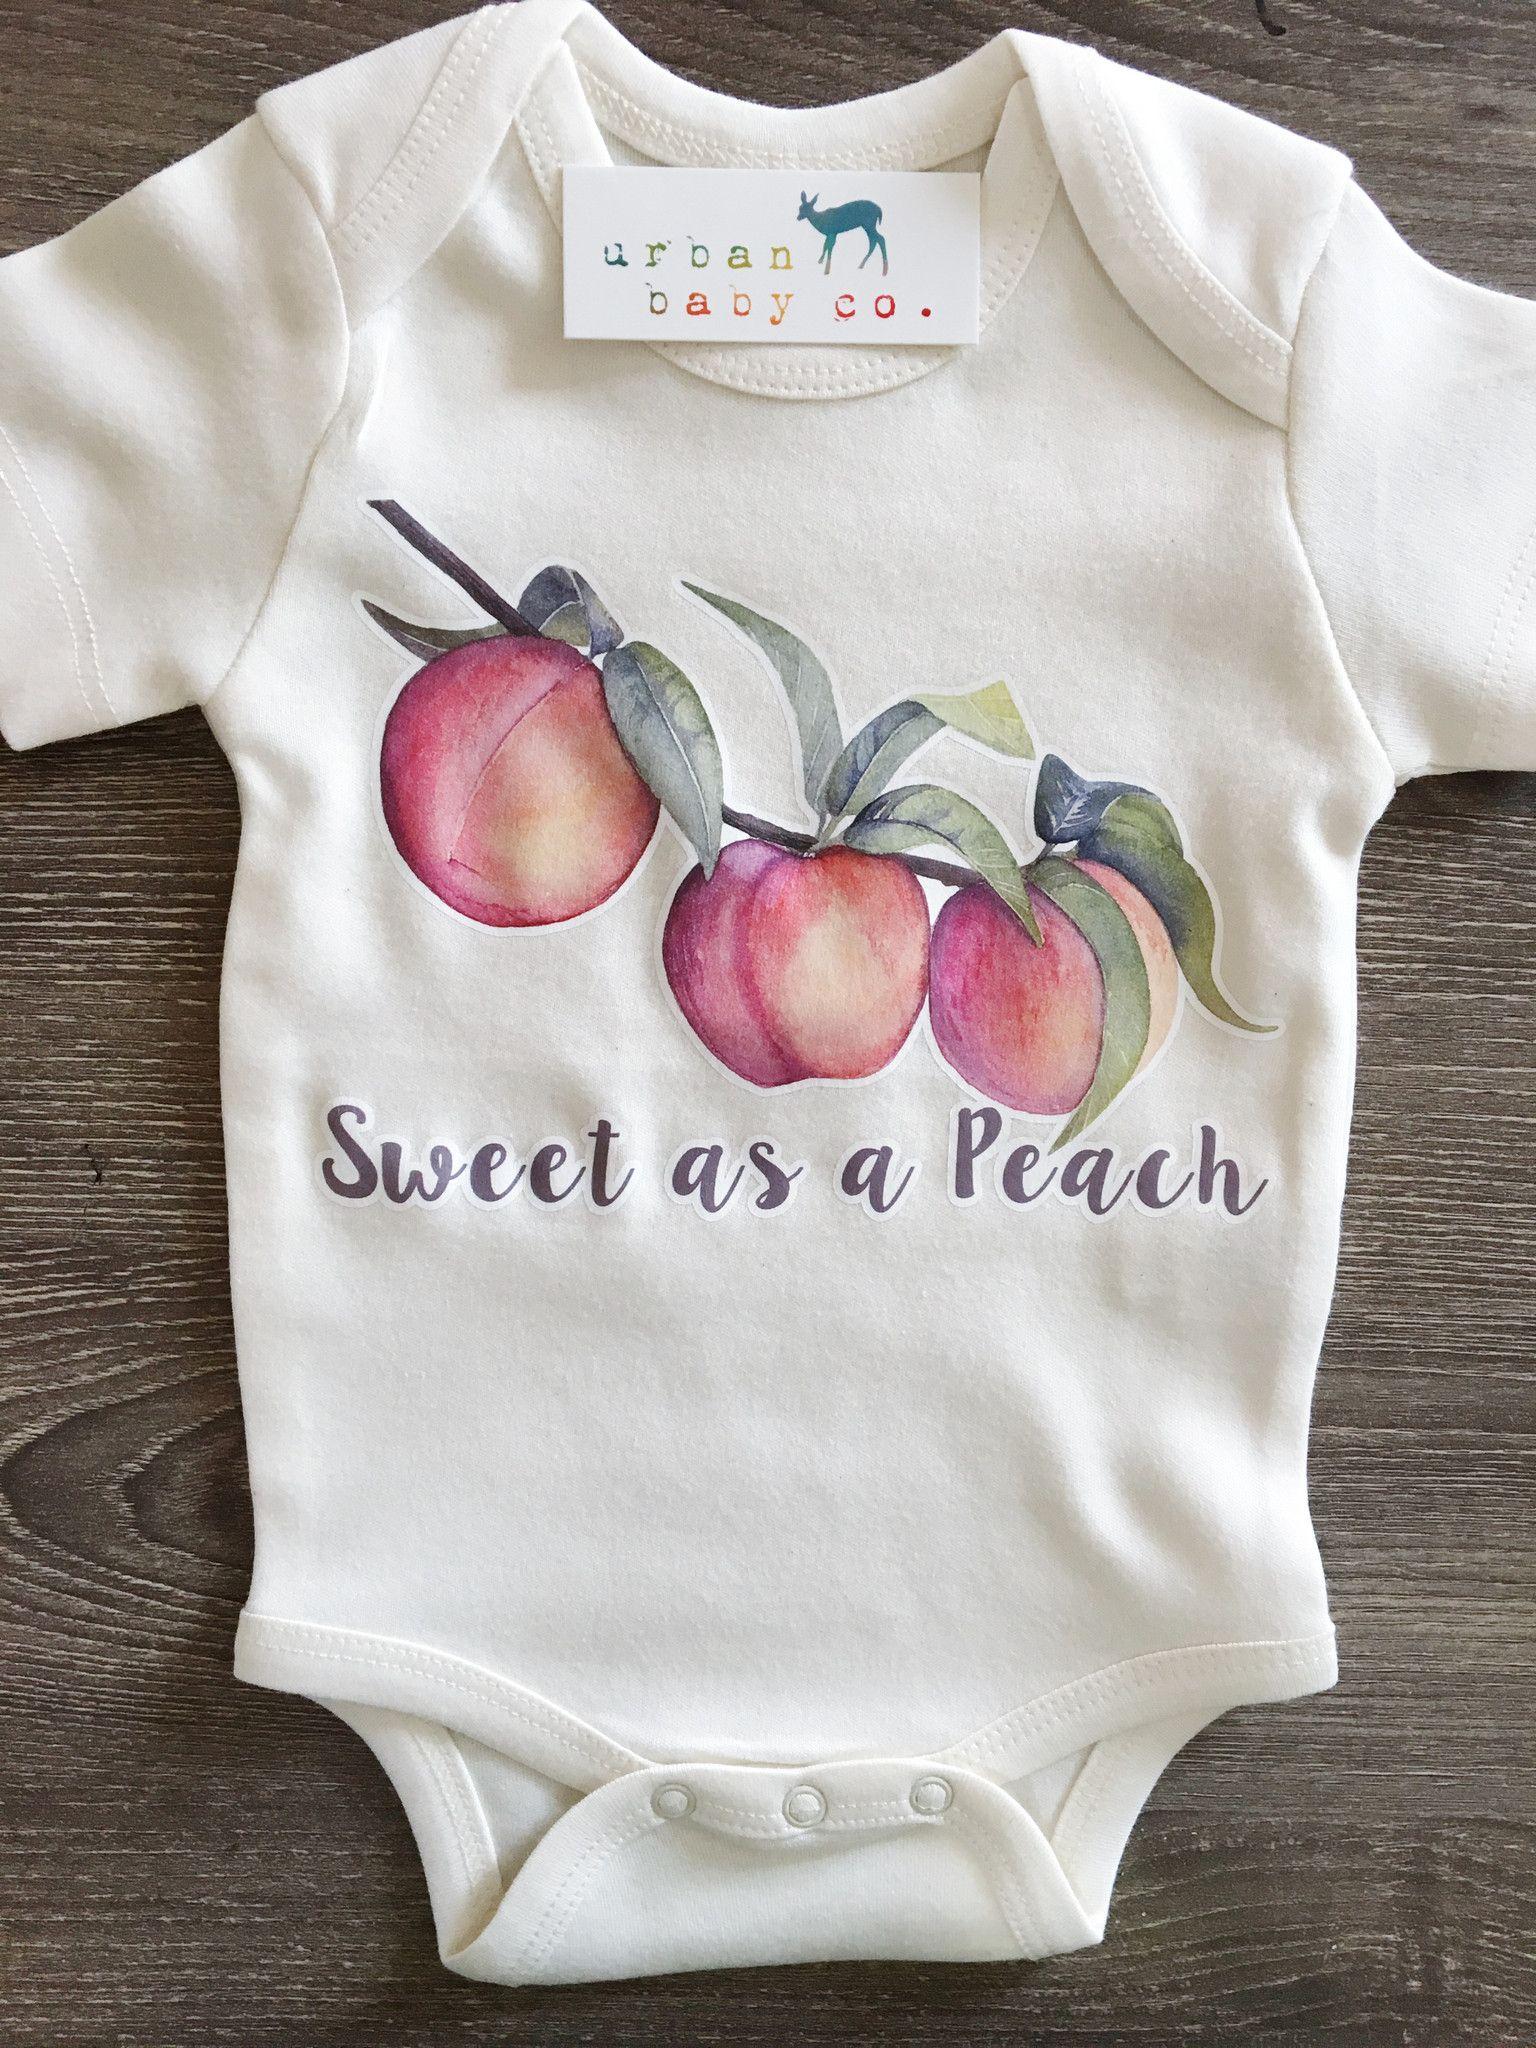 Sweet as a Peach Baby Boy Girl Uni Gender Neutral Infant